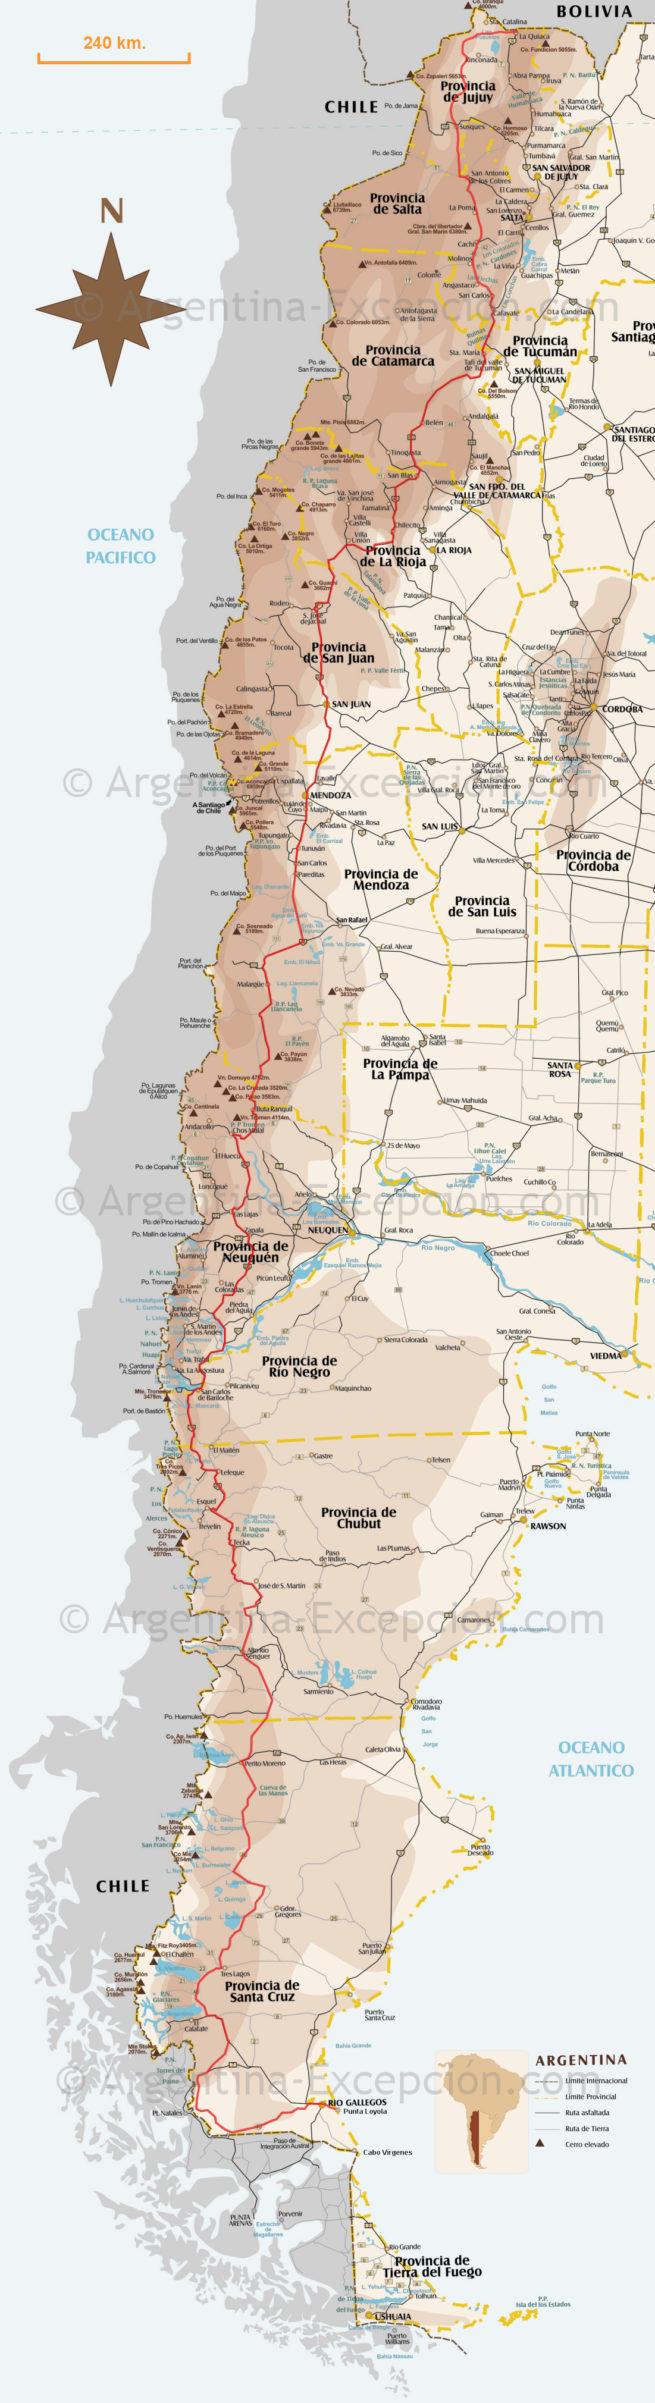 Carte route 40